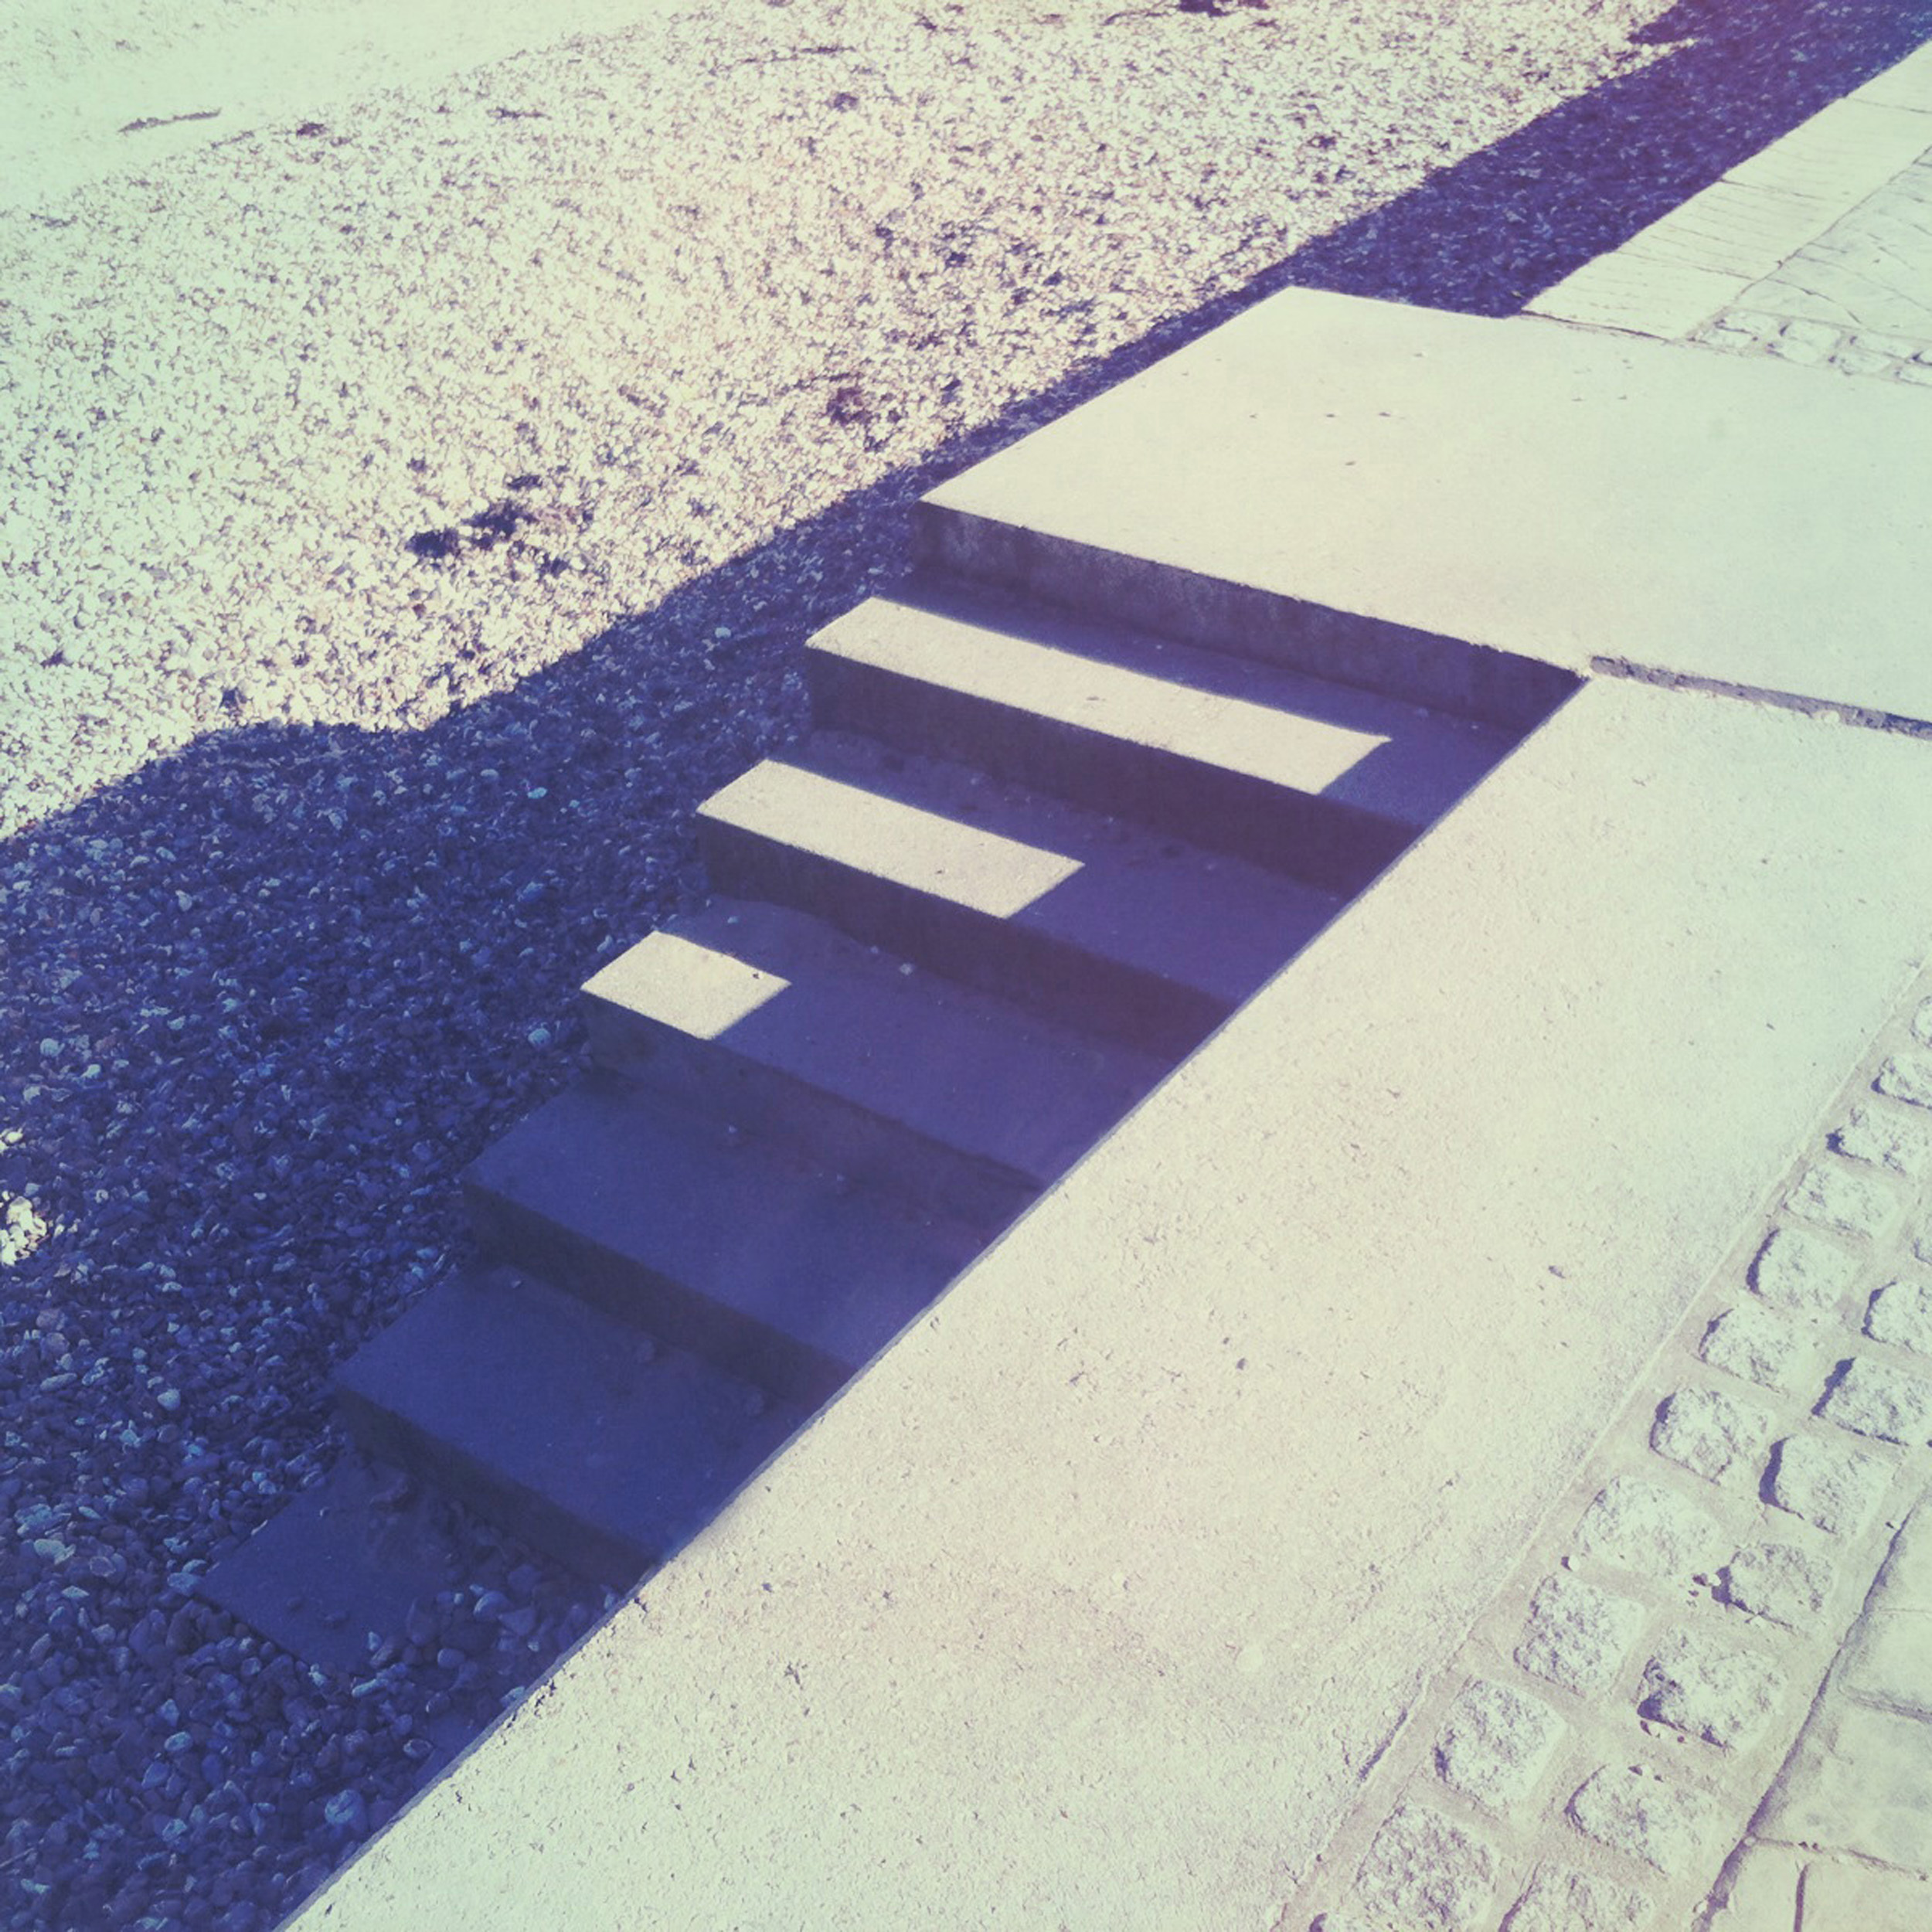 St helens steps